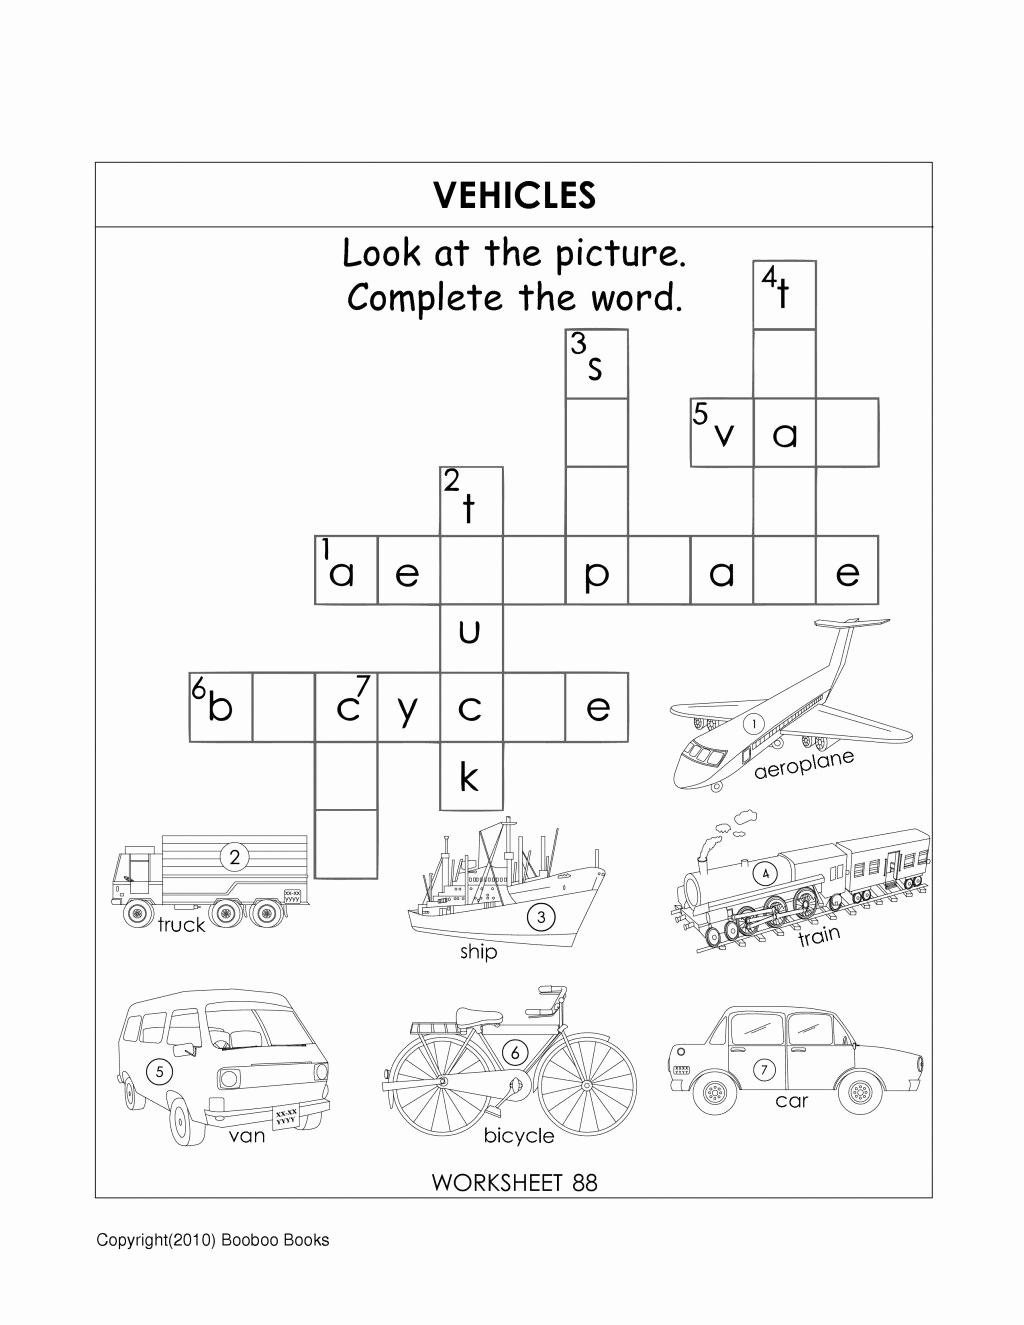 Kindergarten Addition Word Problems Worksheets Lovely 20 Kindergarten Addition Word Problems Worksheets